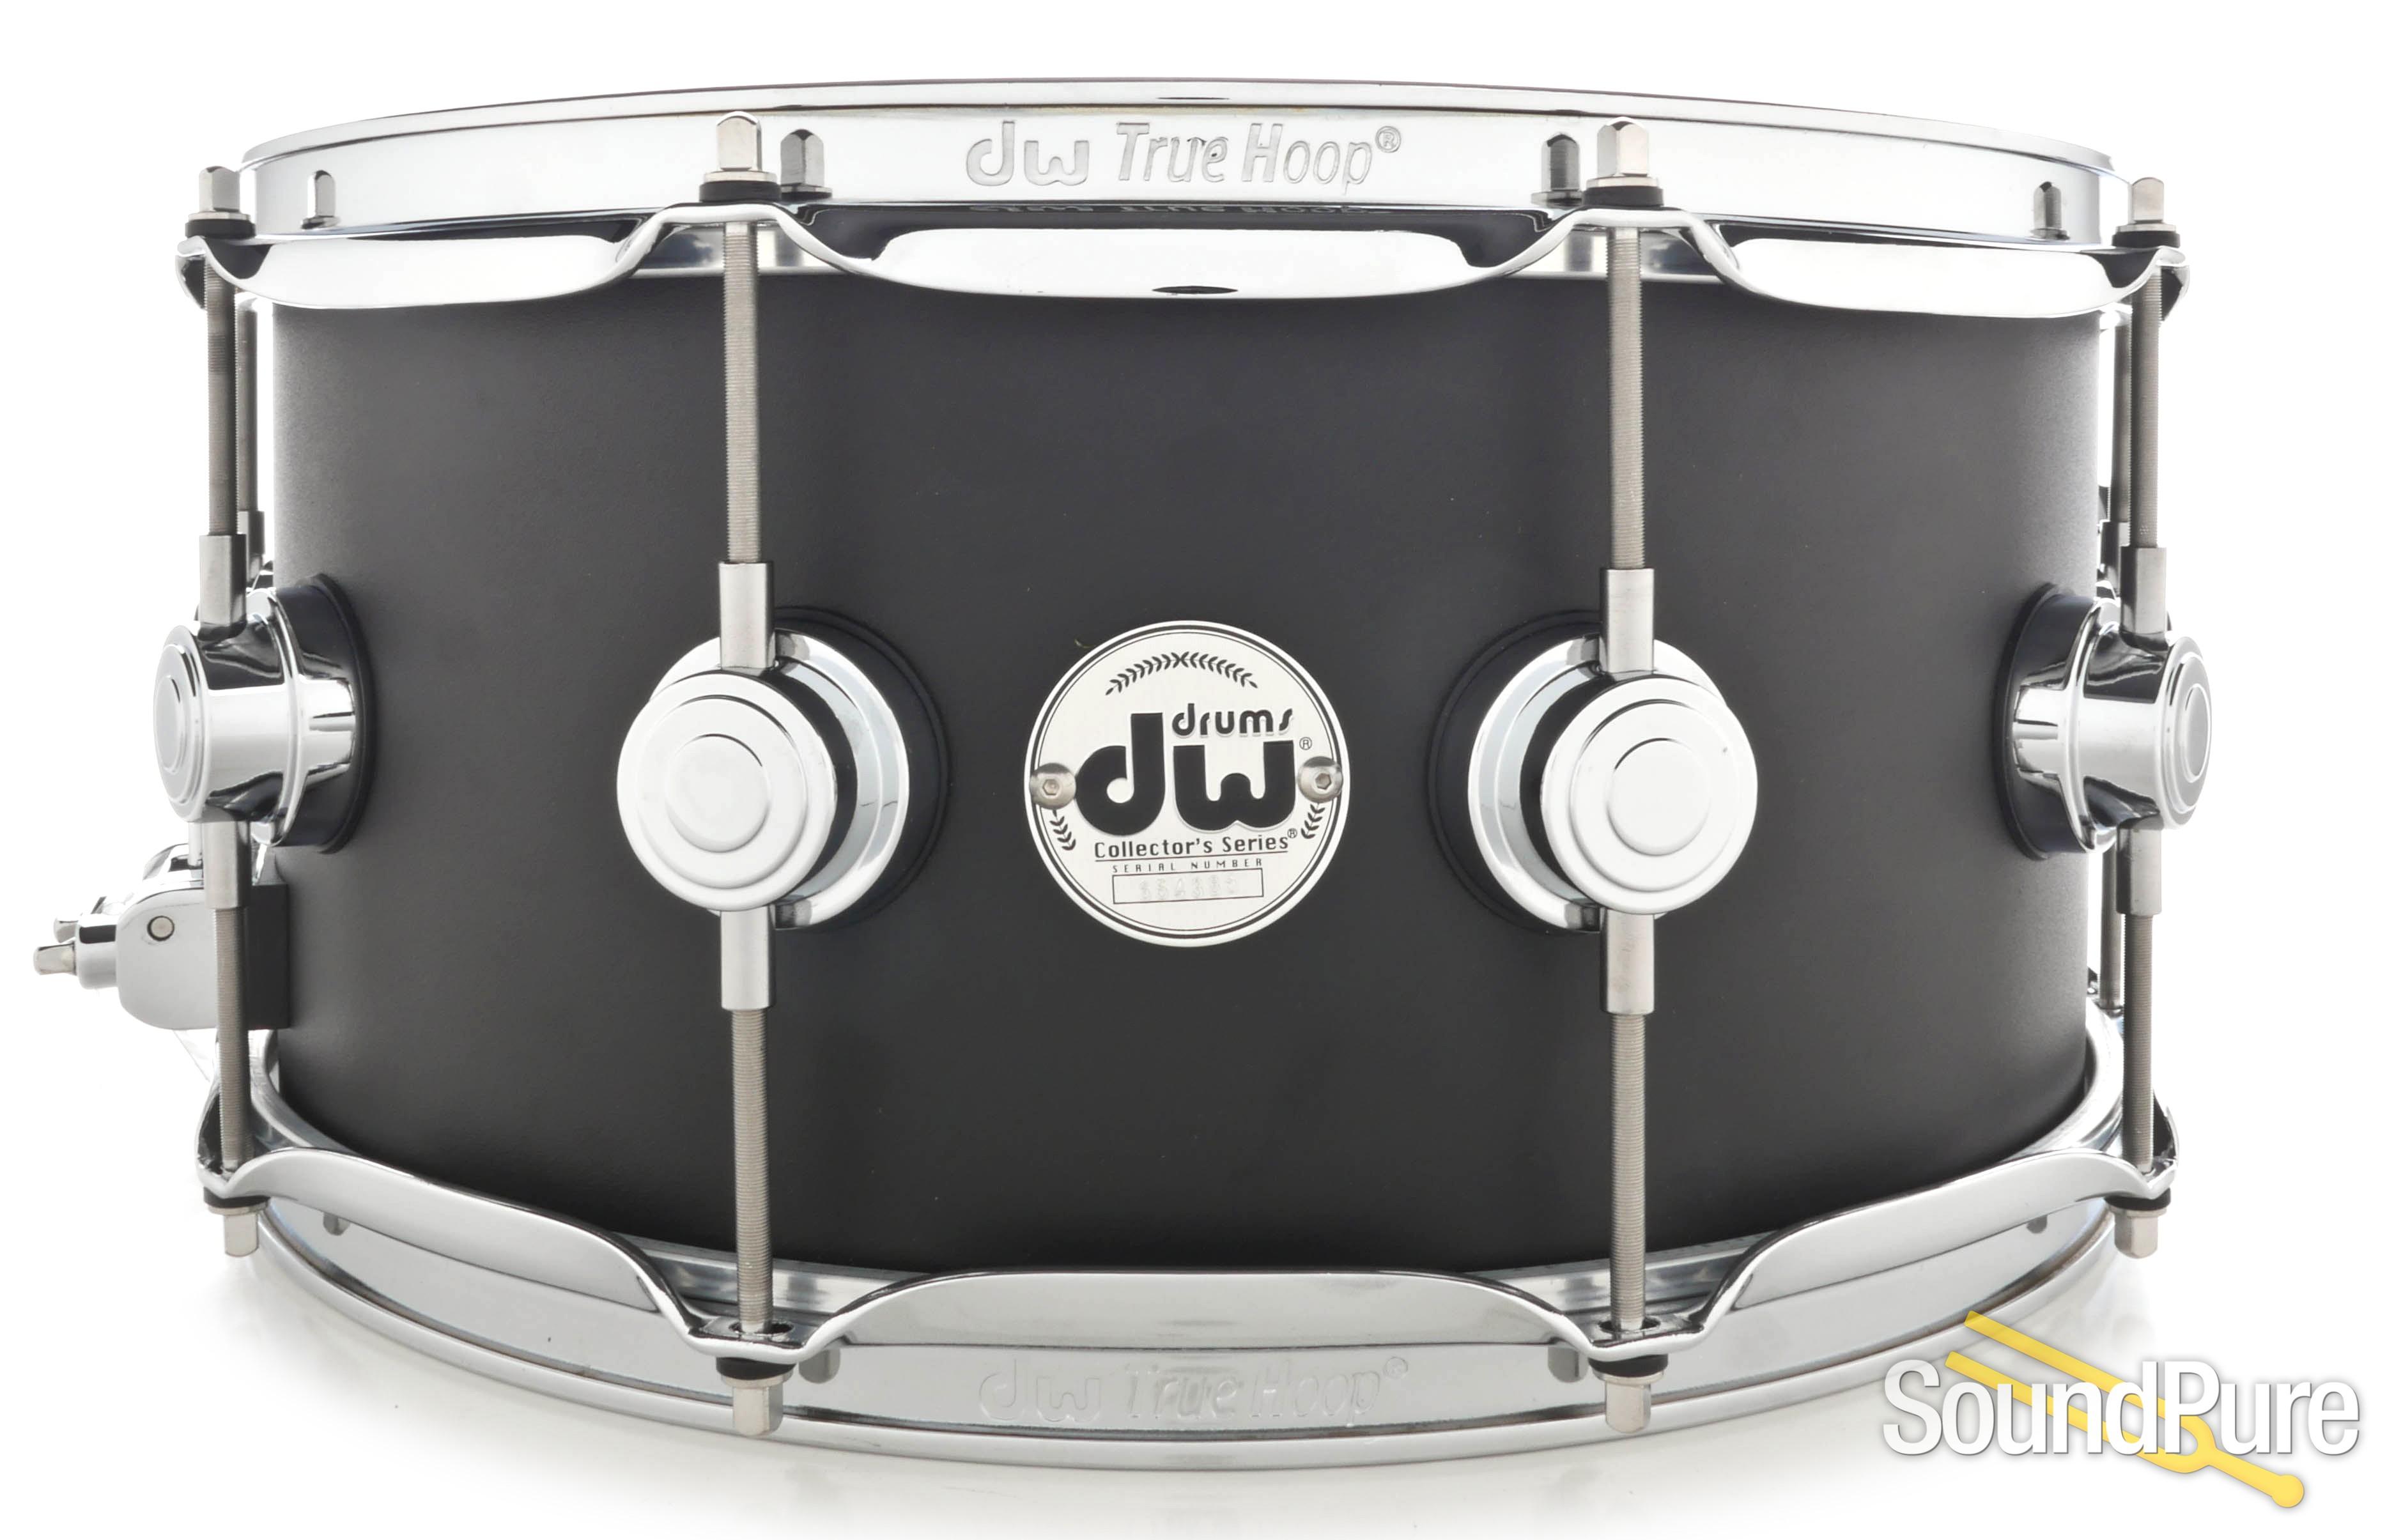 DW 6.5x14 Collectors Solid Aluminum Snare Drum-Black